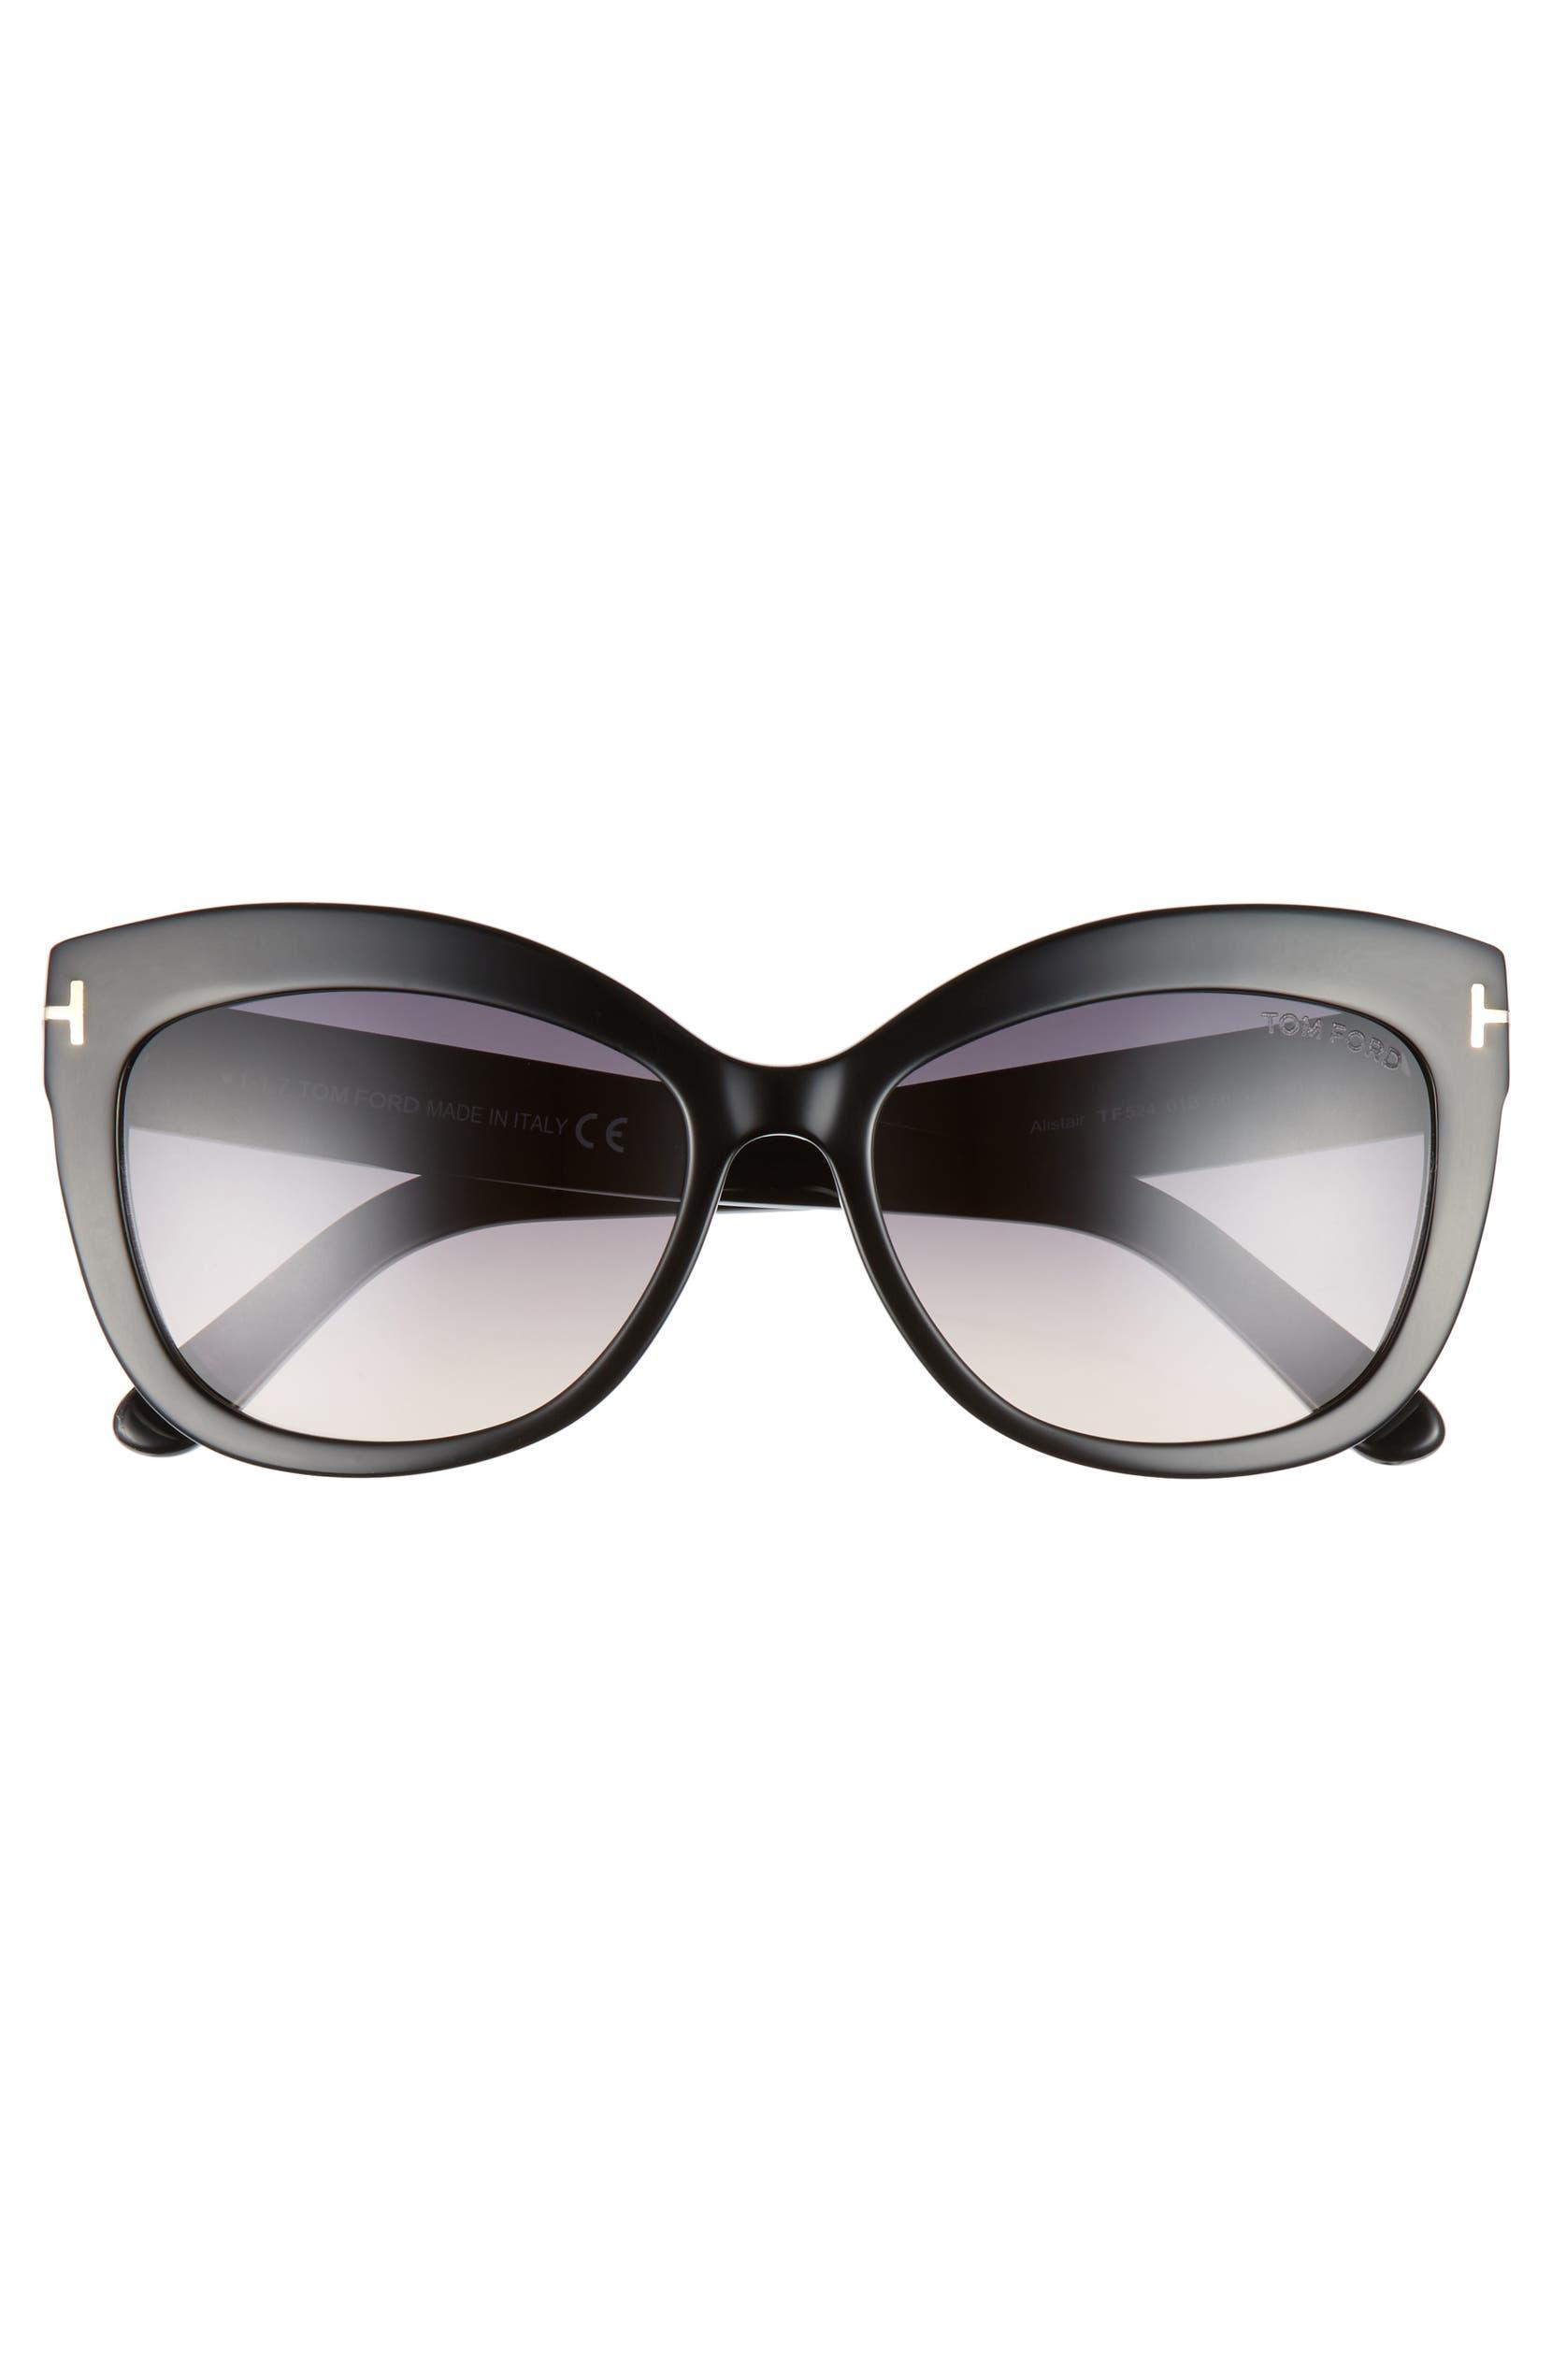 6190eeeb1a47b Tom Ford Alistair 56mm Gradient Sunglasses